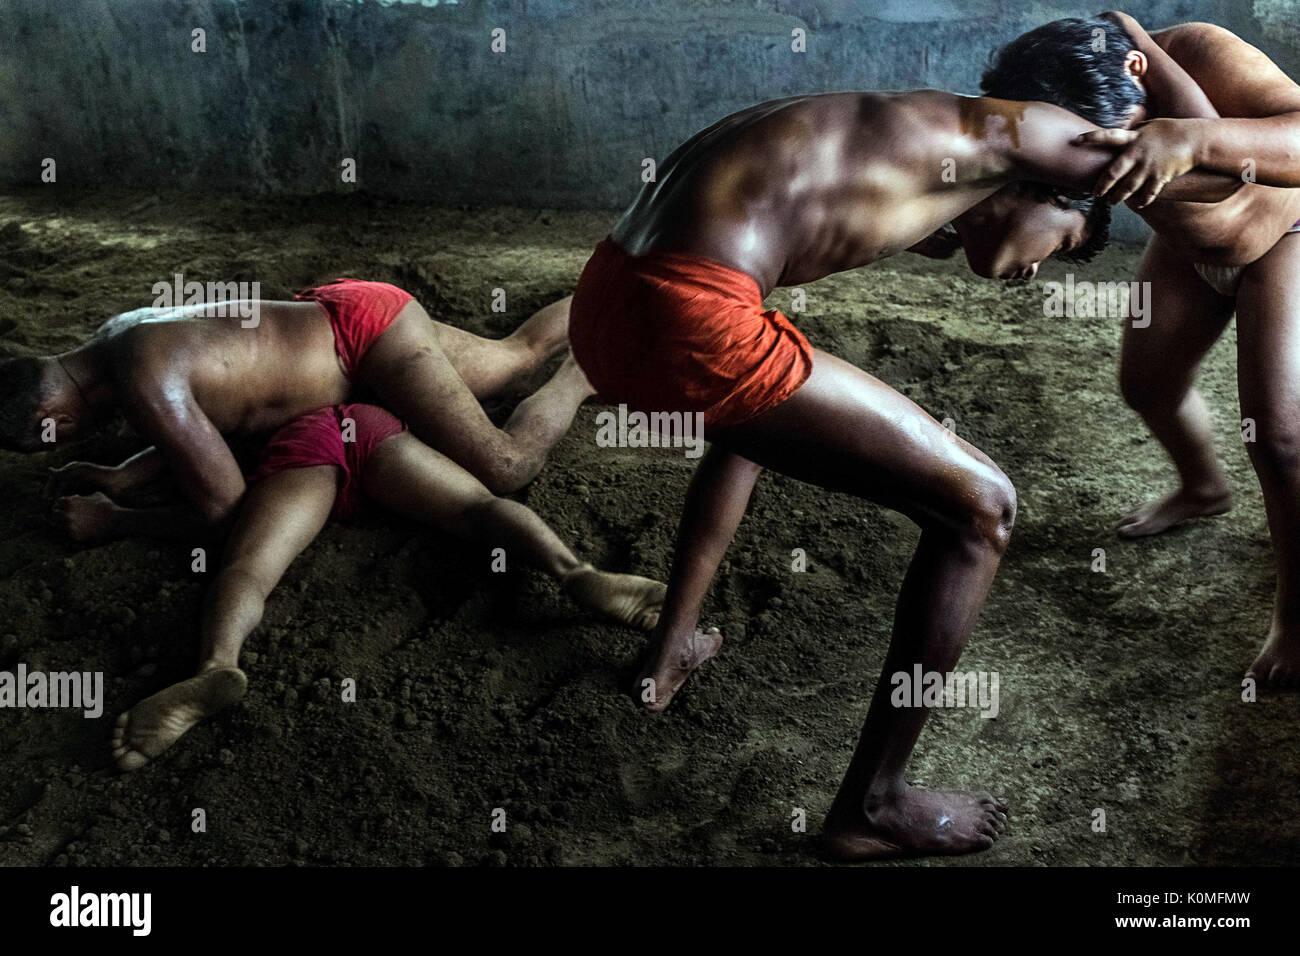 wrestling in akharas kolkata west bengal, India, Asia - Stock Image